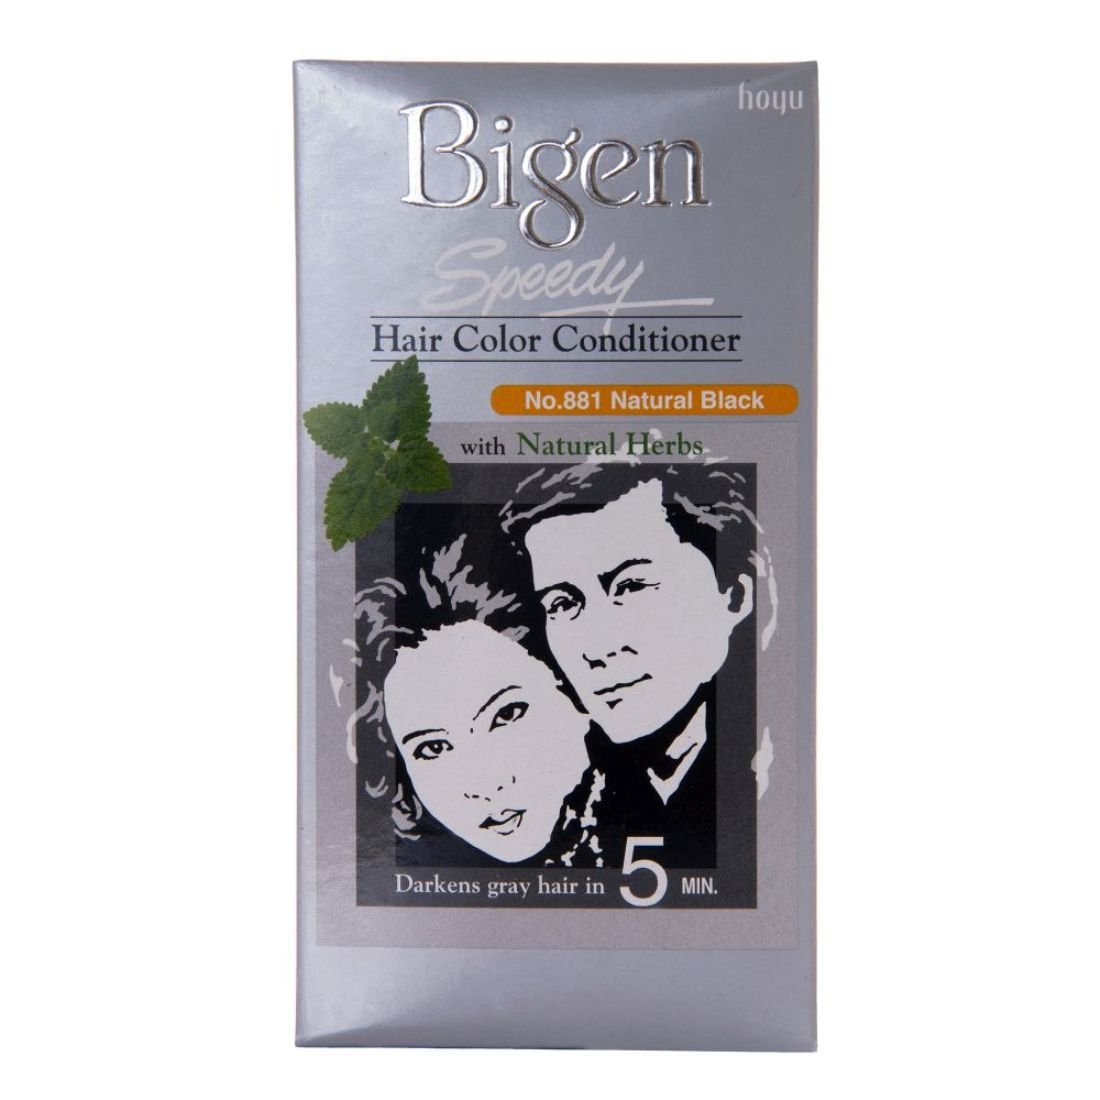 Bigen Speedy Hair Color, Natural Black 881 (40g + 40g) product image